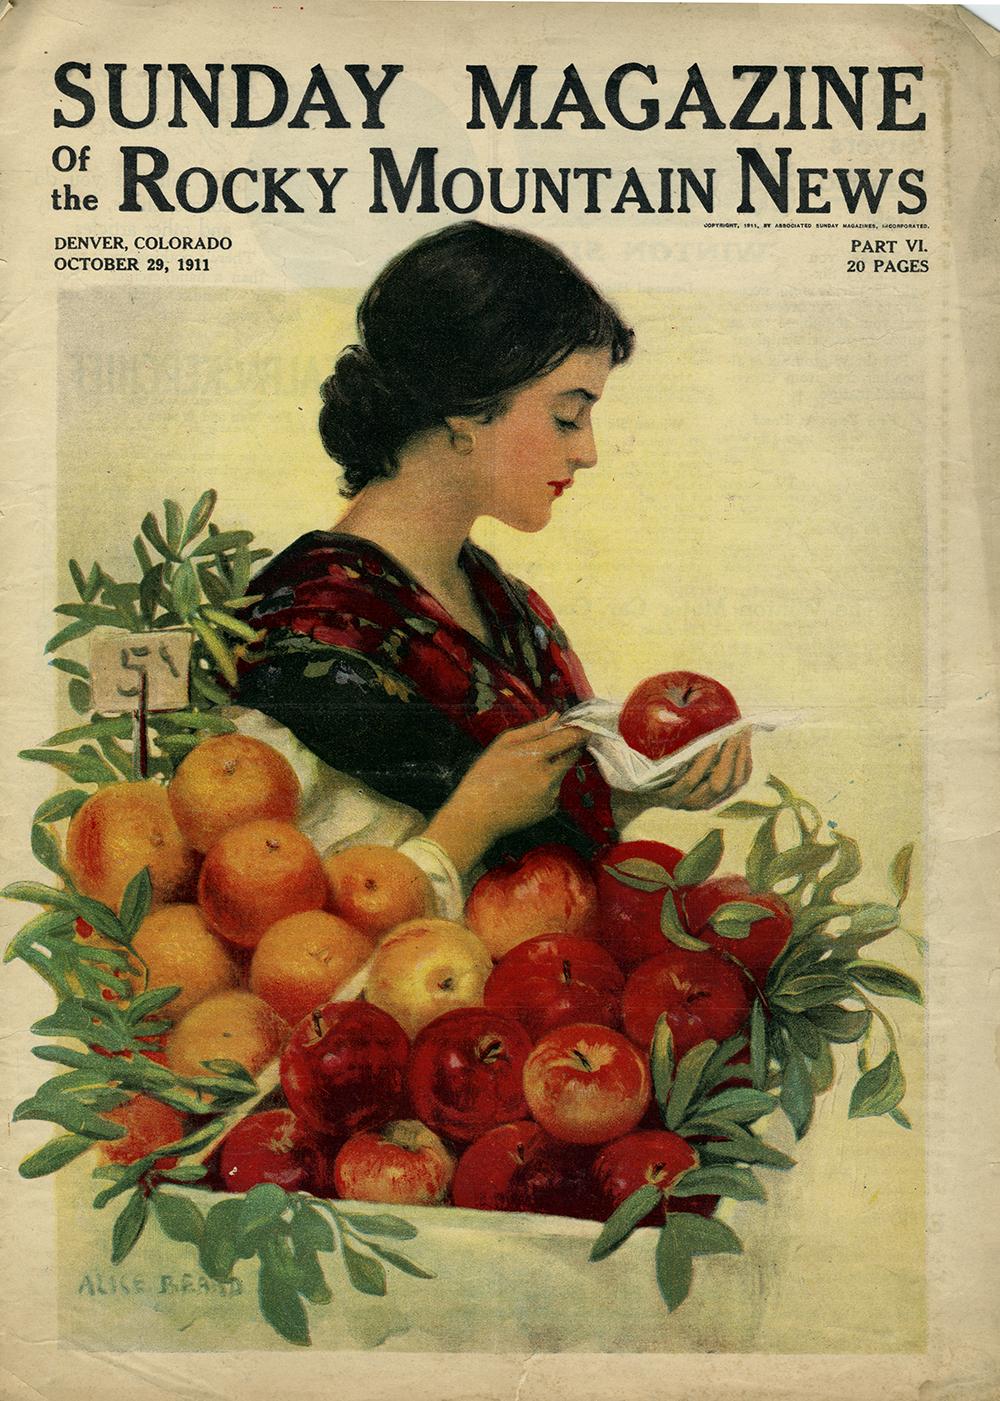 Alice Beard, Cover Illustration. Sunday Magazine of the Rocky Mountain News. October 29, 1911.